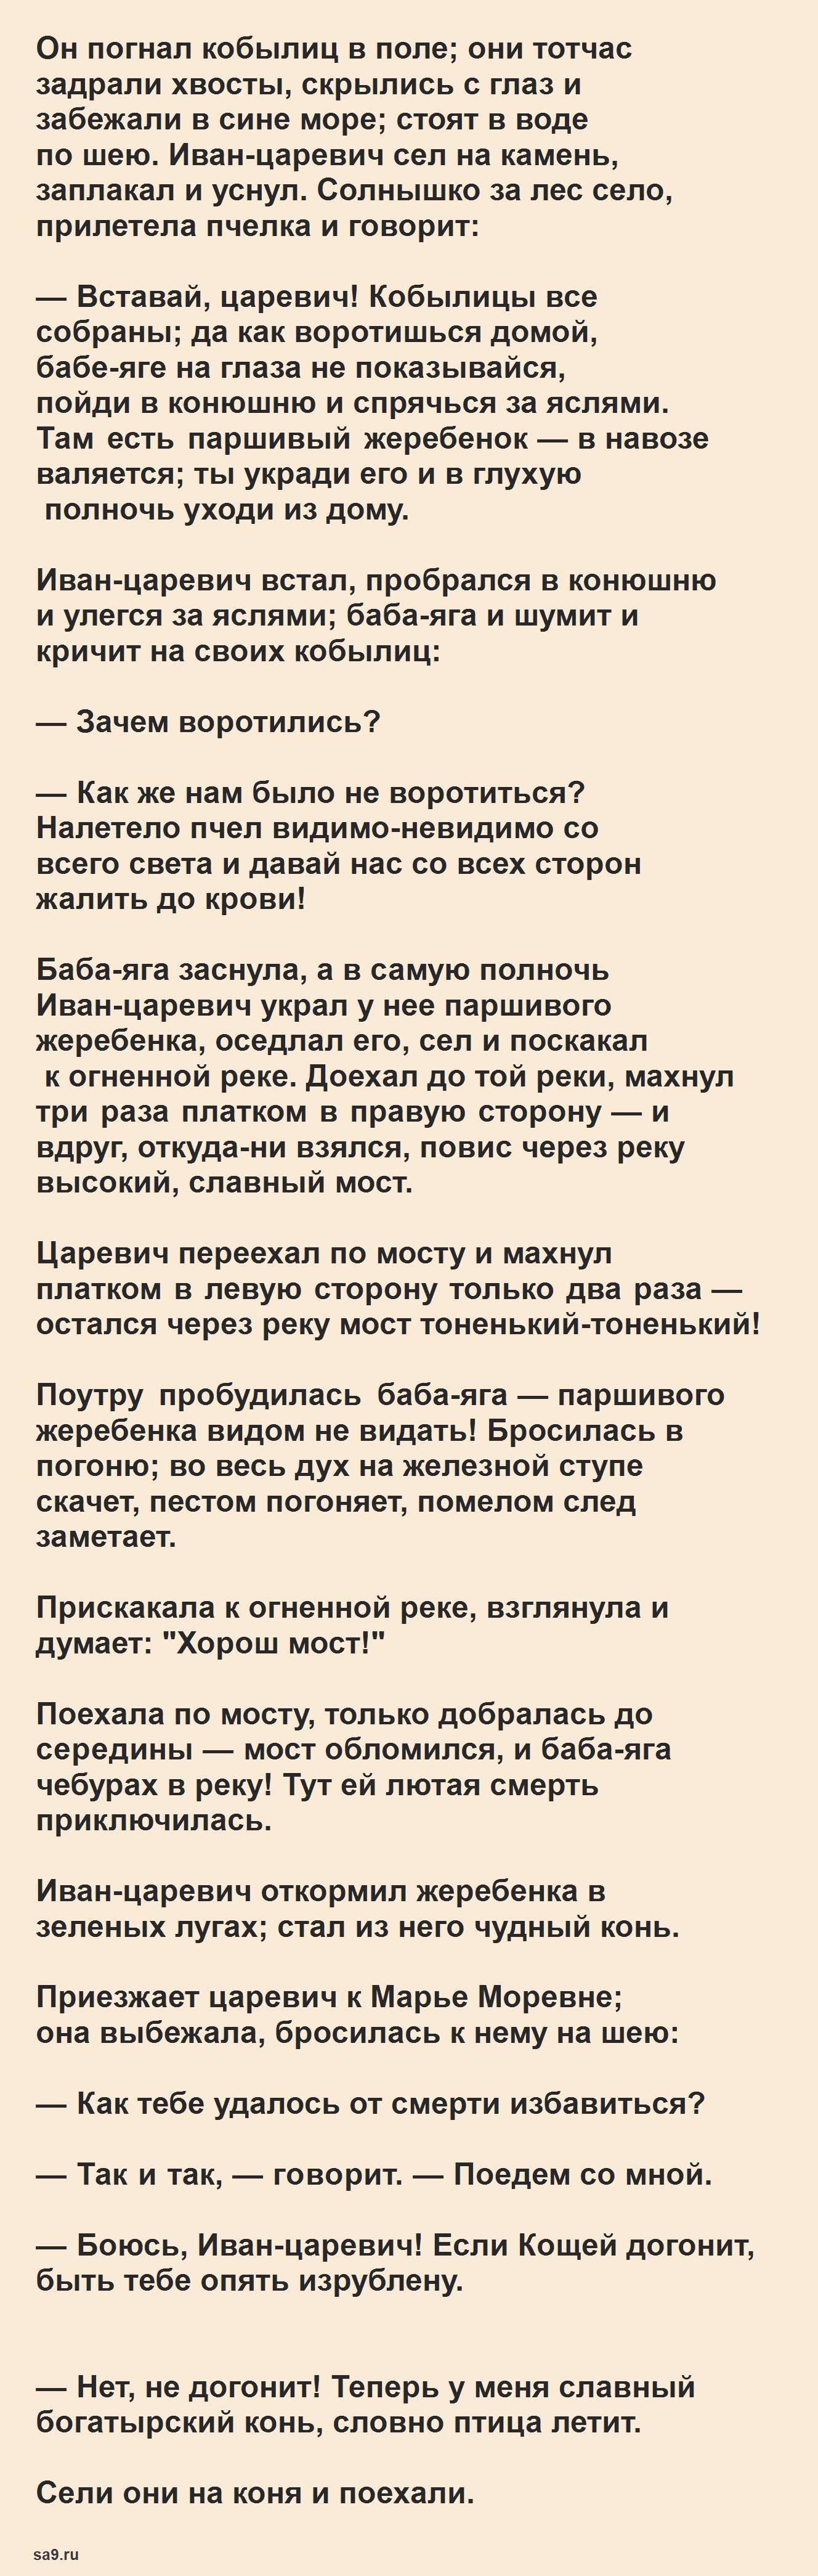 Марья Моревна - русская народная сказка